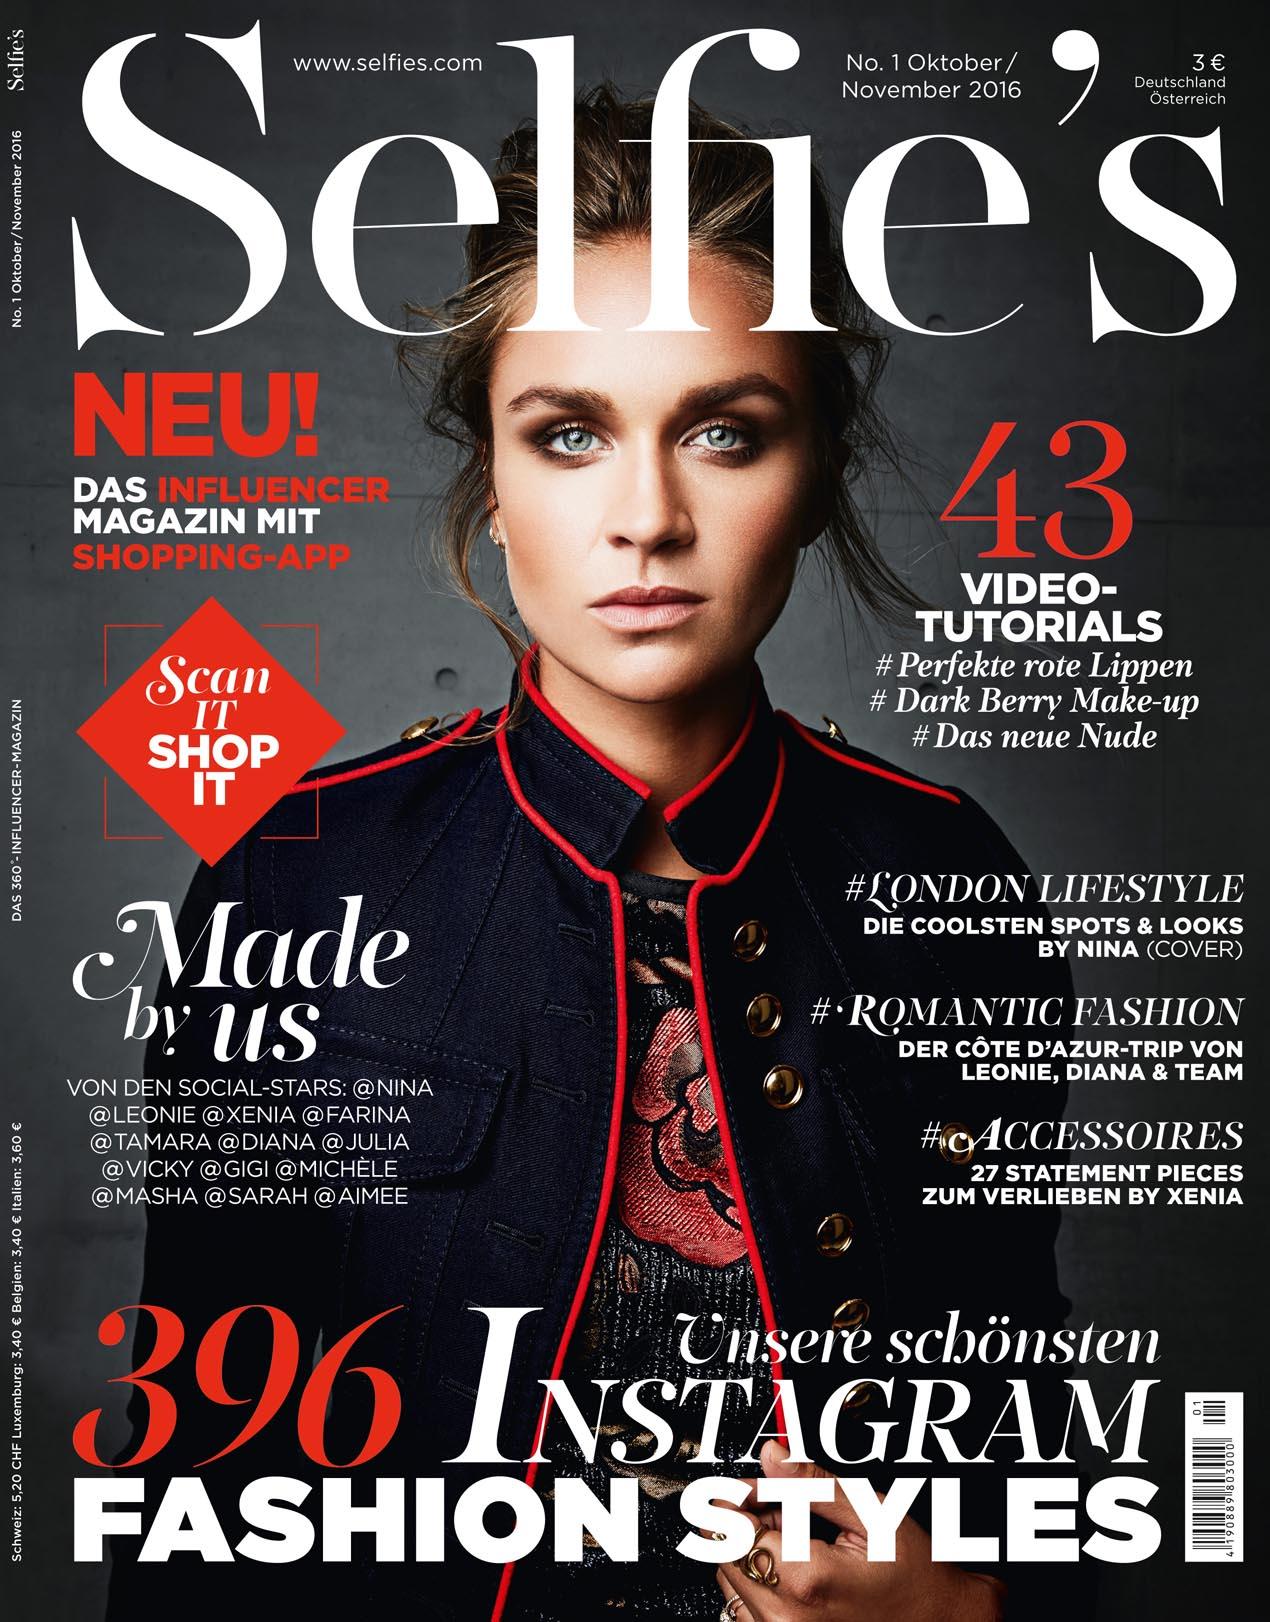 Burberry Druck Selfie's magazine cover